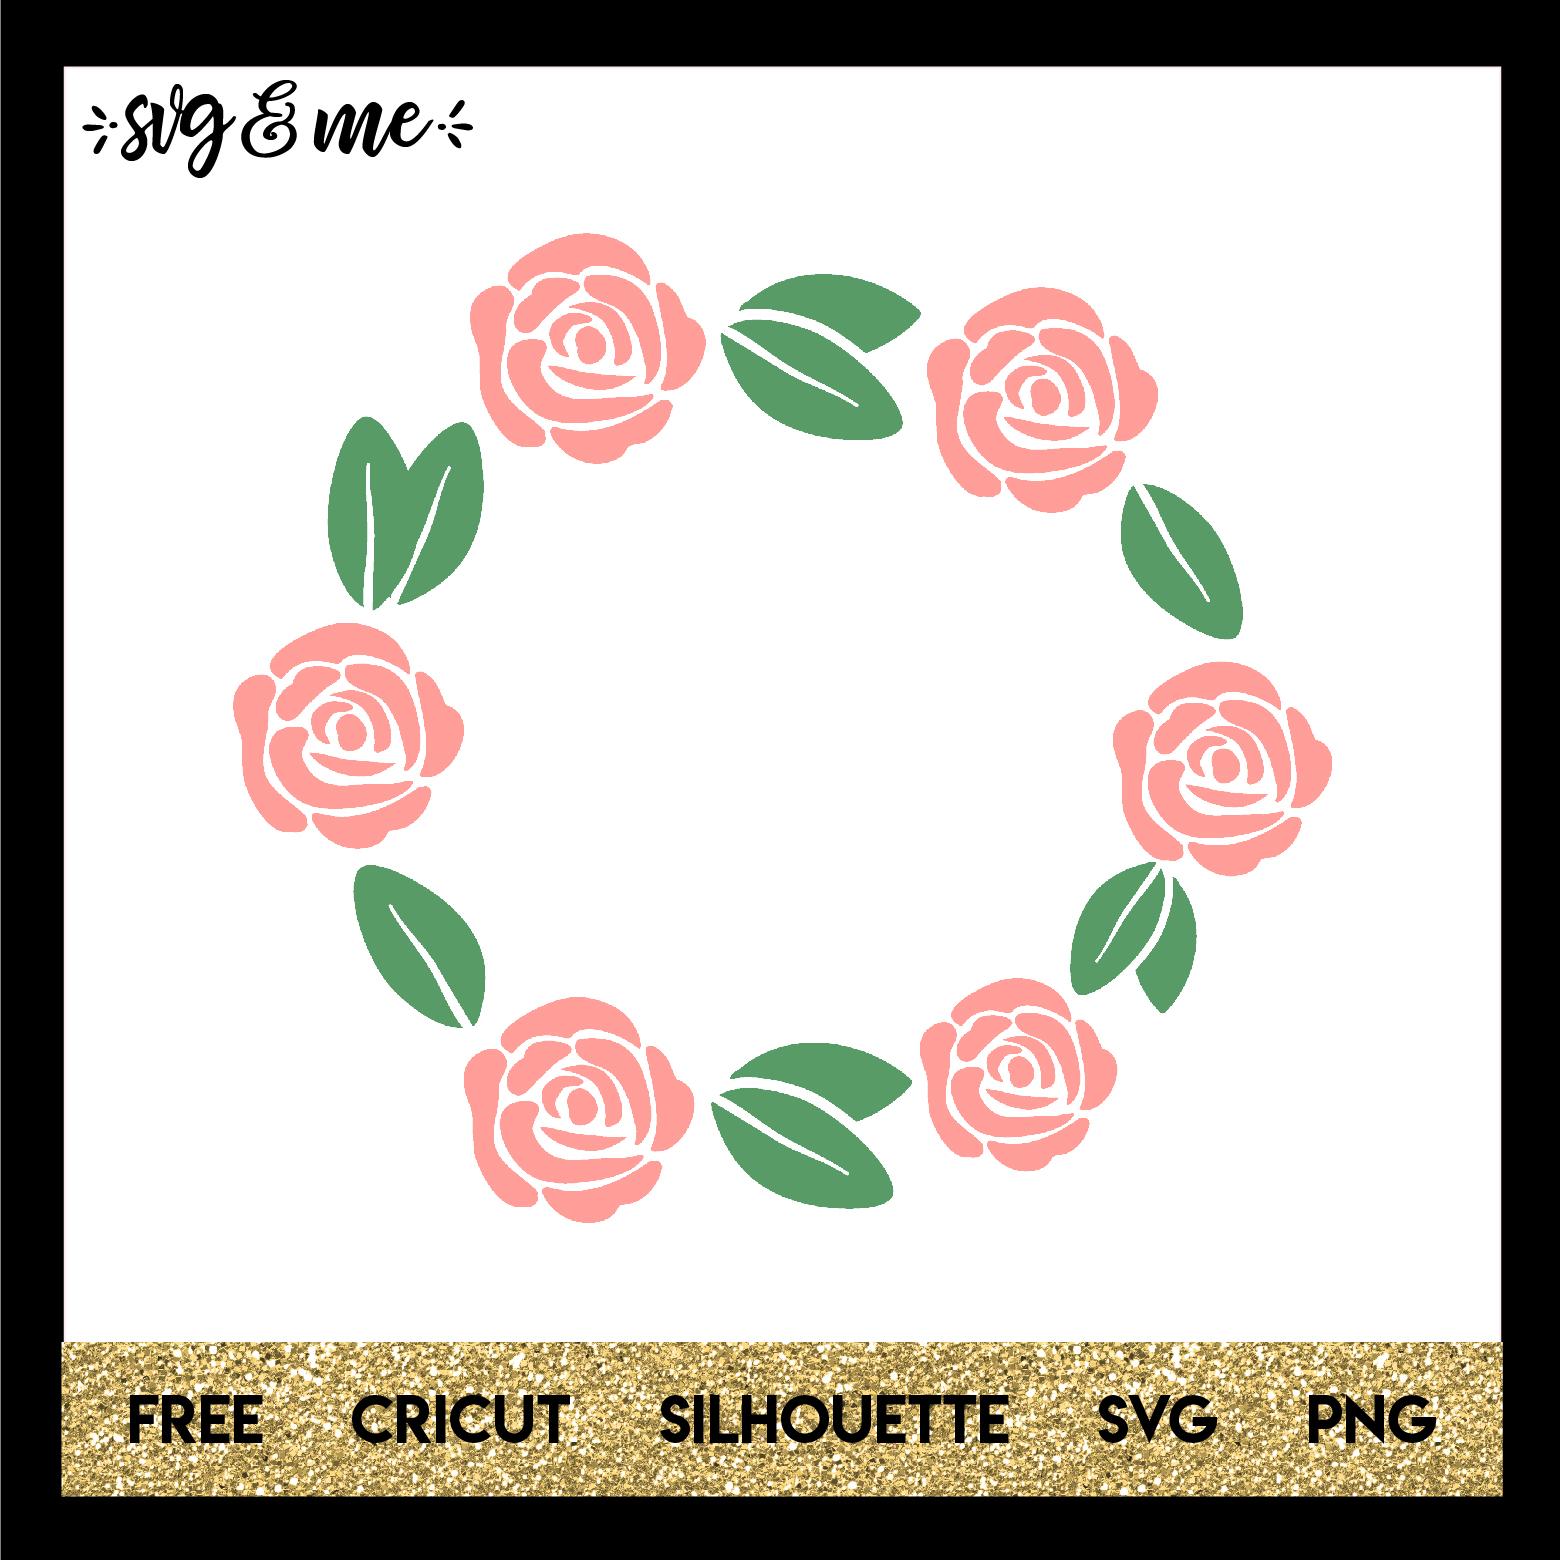 rose svg free #567, Download drawings